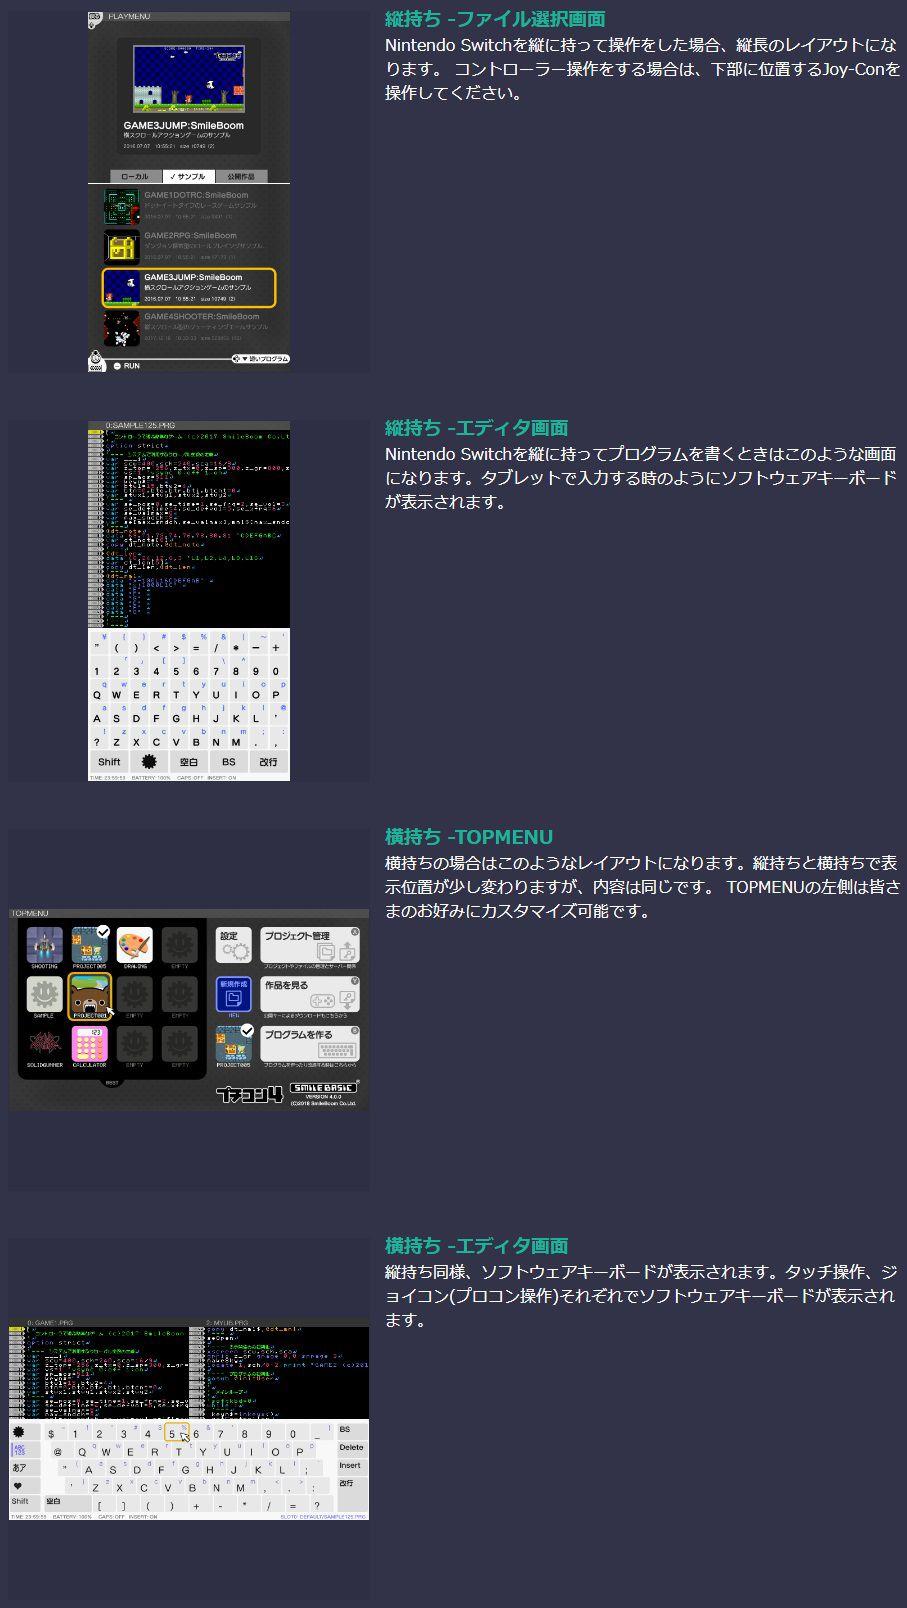 image_11368.jpg